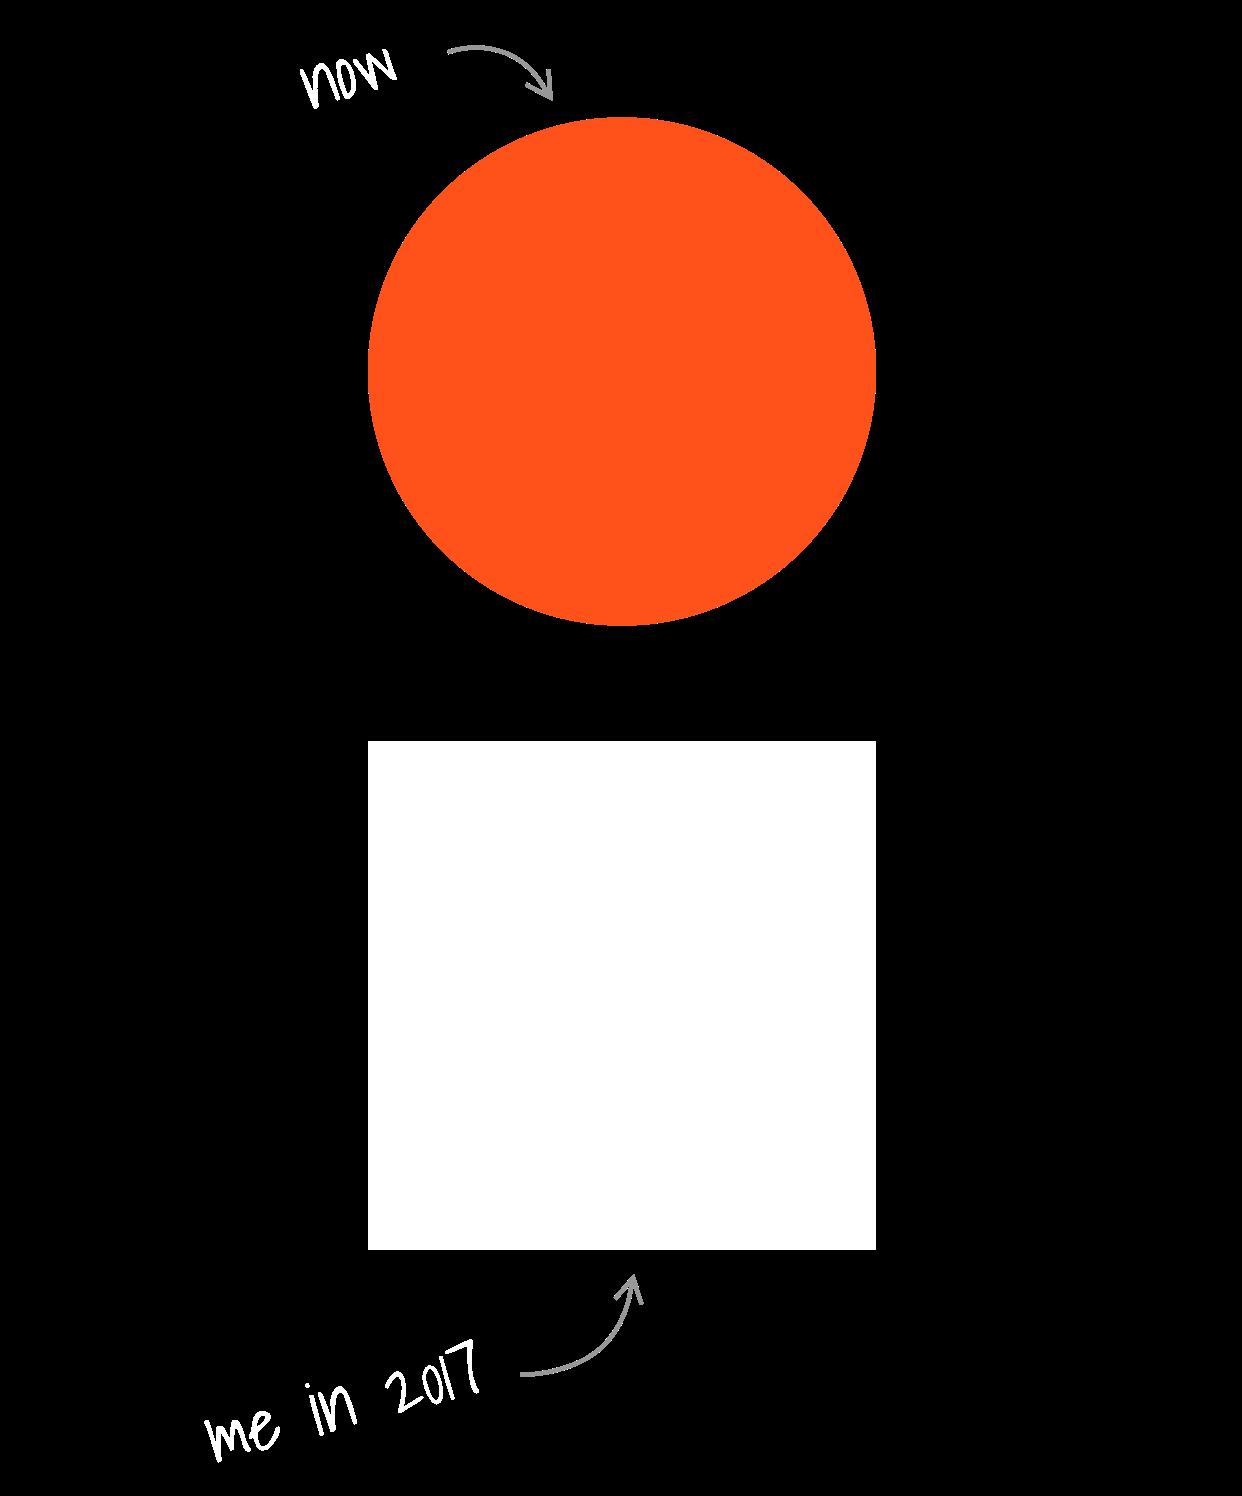 journey_image